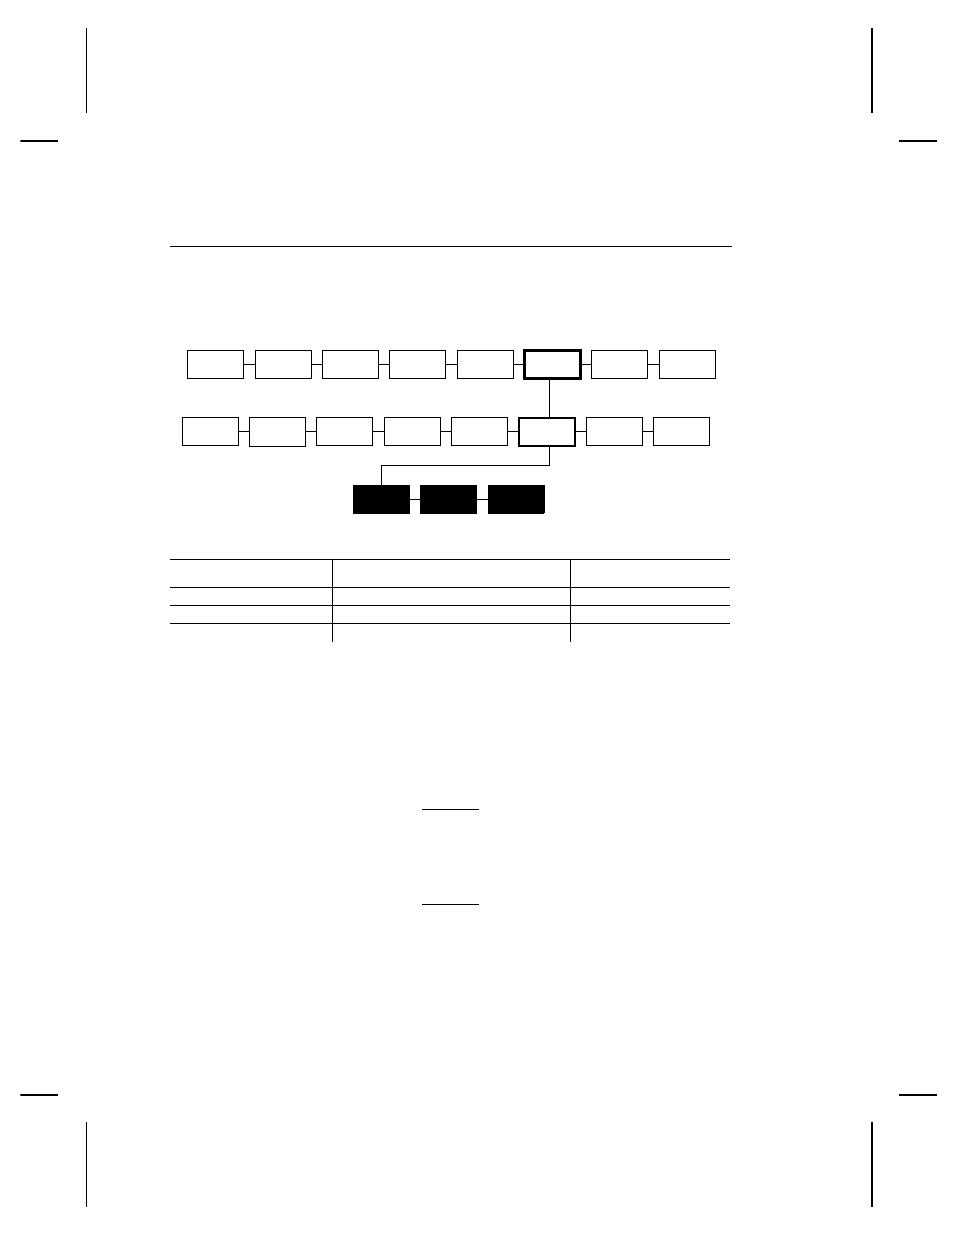 setting defaults 5 9 paxar monarch 9855 rfid printer user manual rh manualsdir com Monarch Paxar Tag Monarch 9800 Label Printer